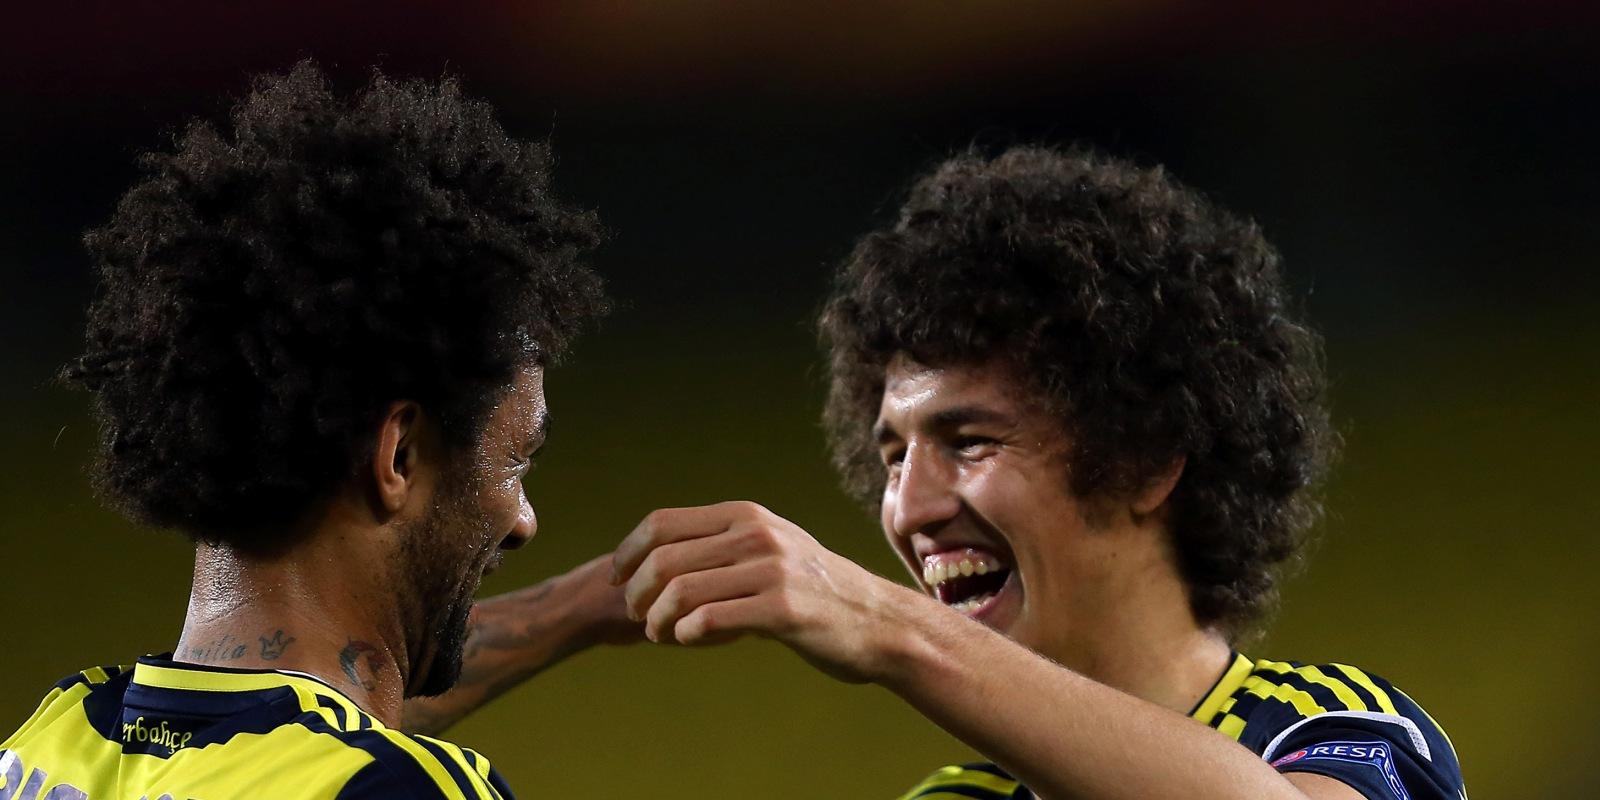 Kuyt met Fenerbahçe verder in Europa League